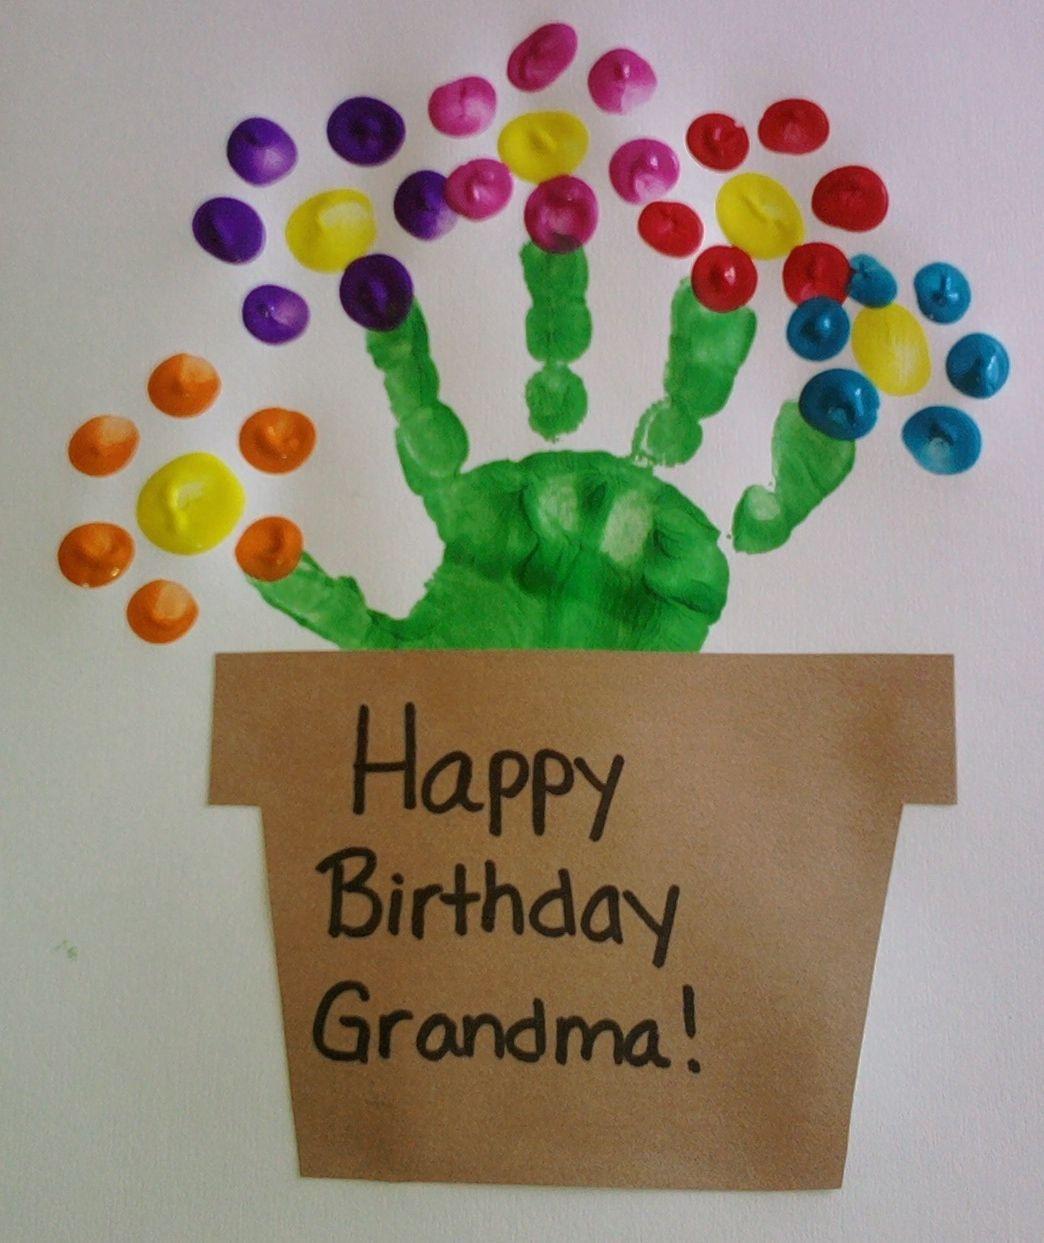 Pin by april parrish on kid stuff pinterest birthday crafts